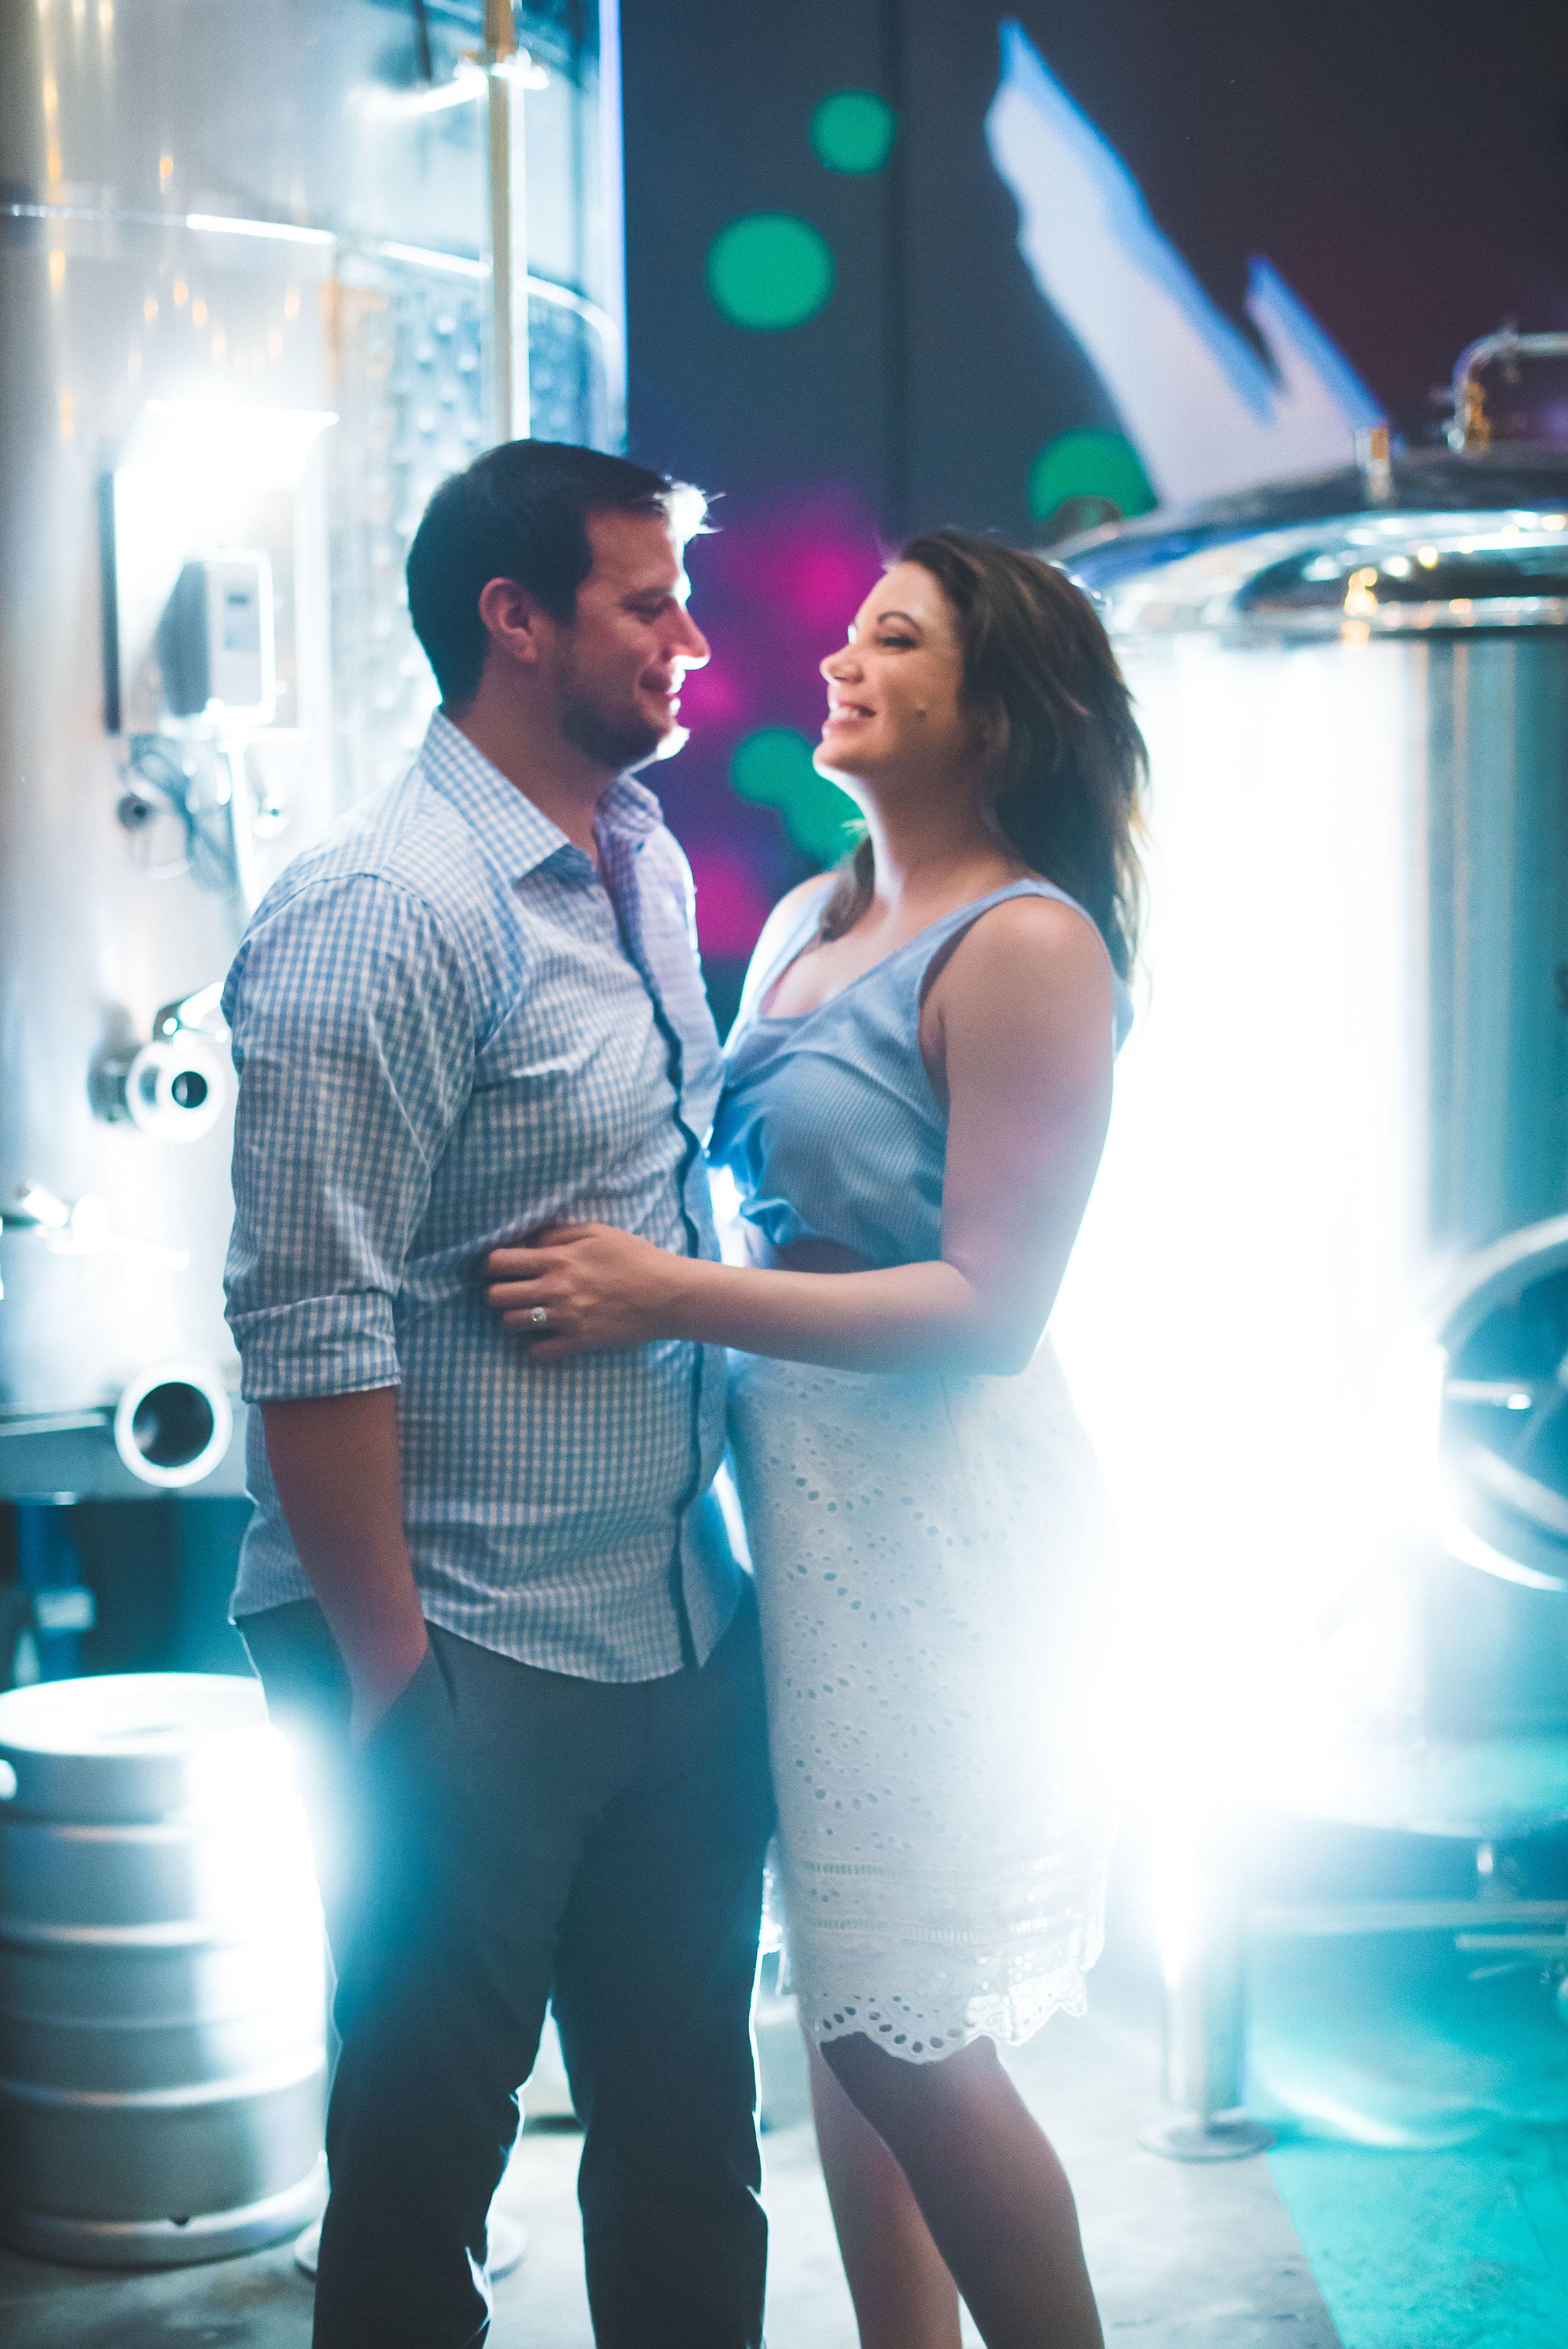 Austin Texas Engagement Photography  Mira Visu Photography Rebecca Hofstetter-1-5.JPG